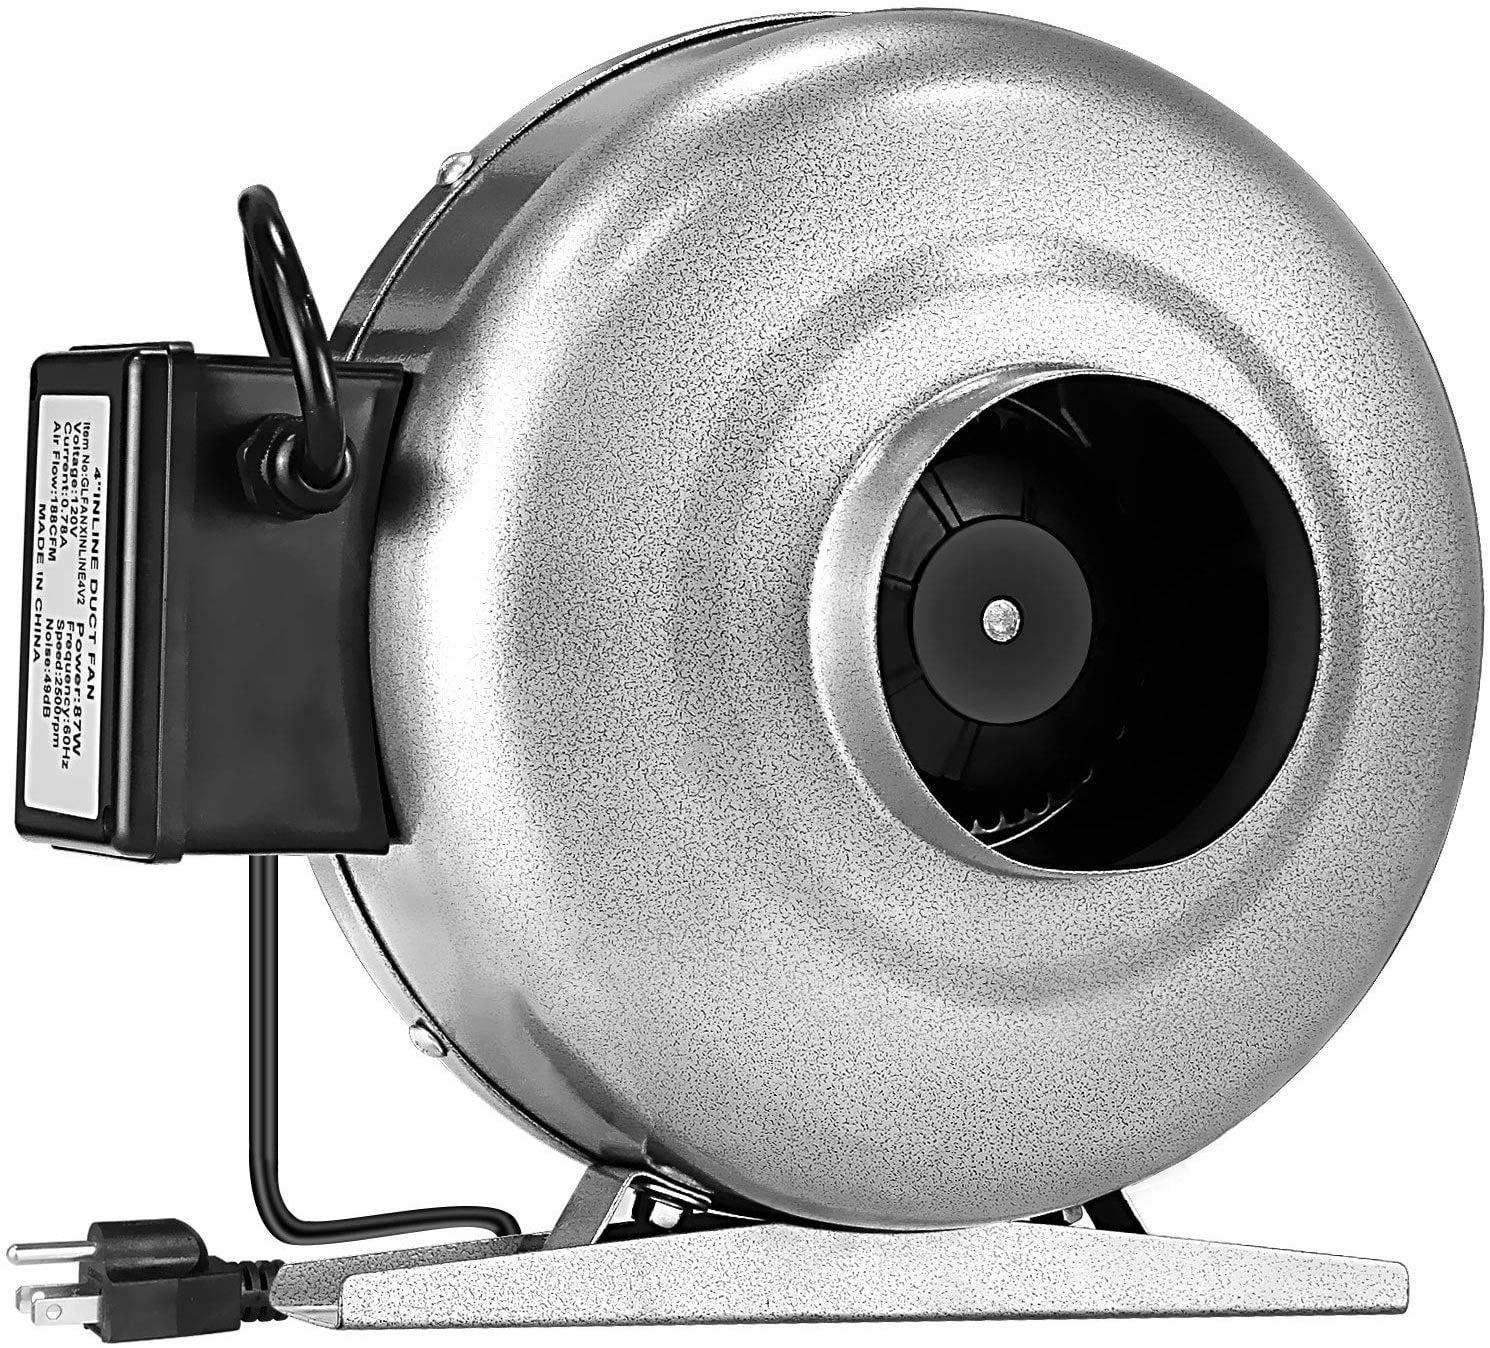 ipower 4 inch 190 cfm inline duct ventilation hvac vent blower fan for grow tent silver walmart com